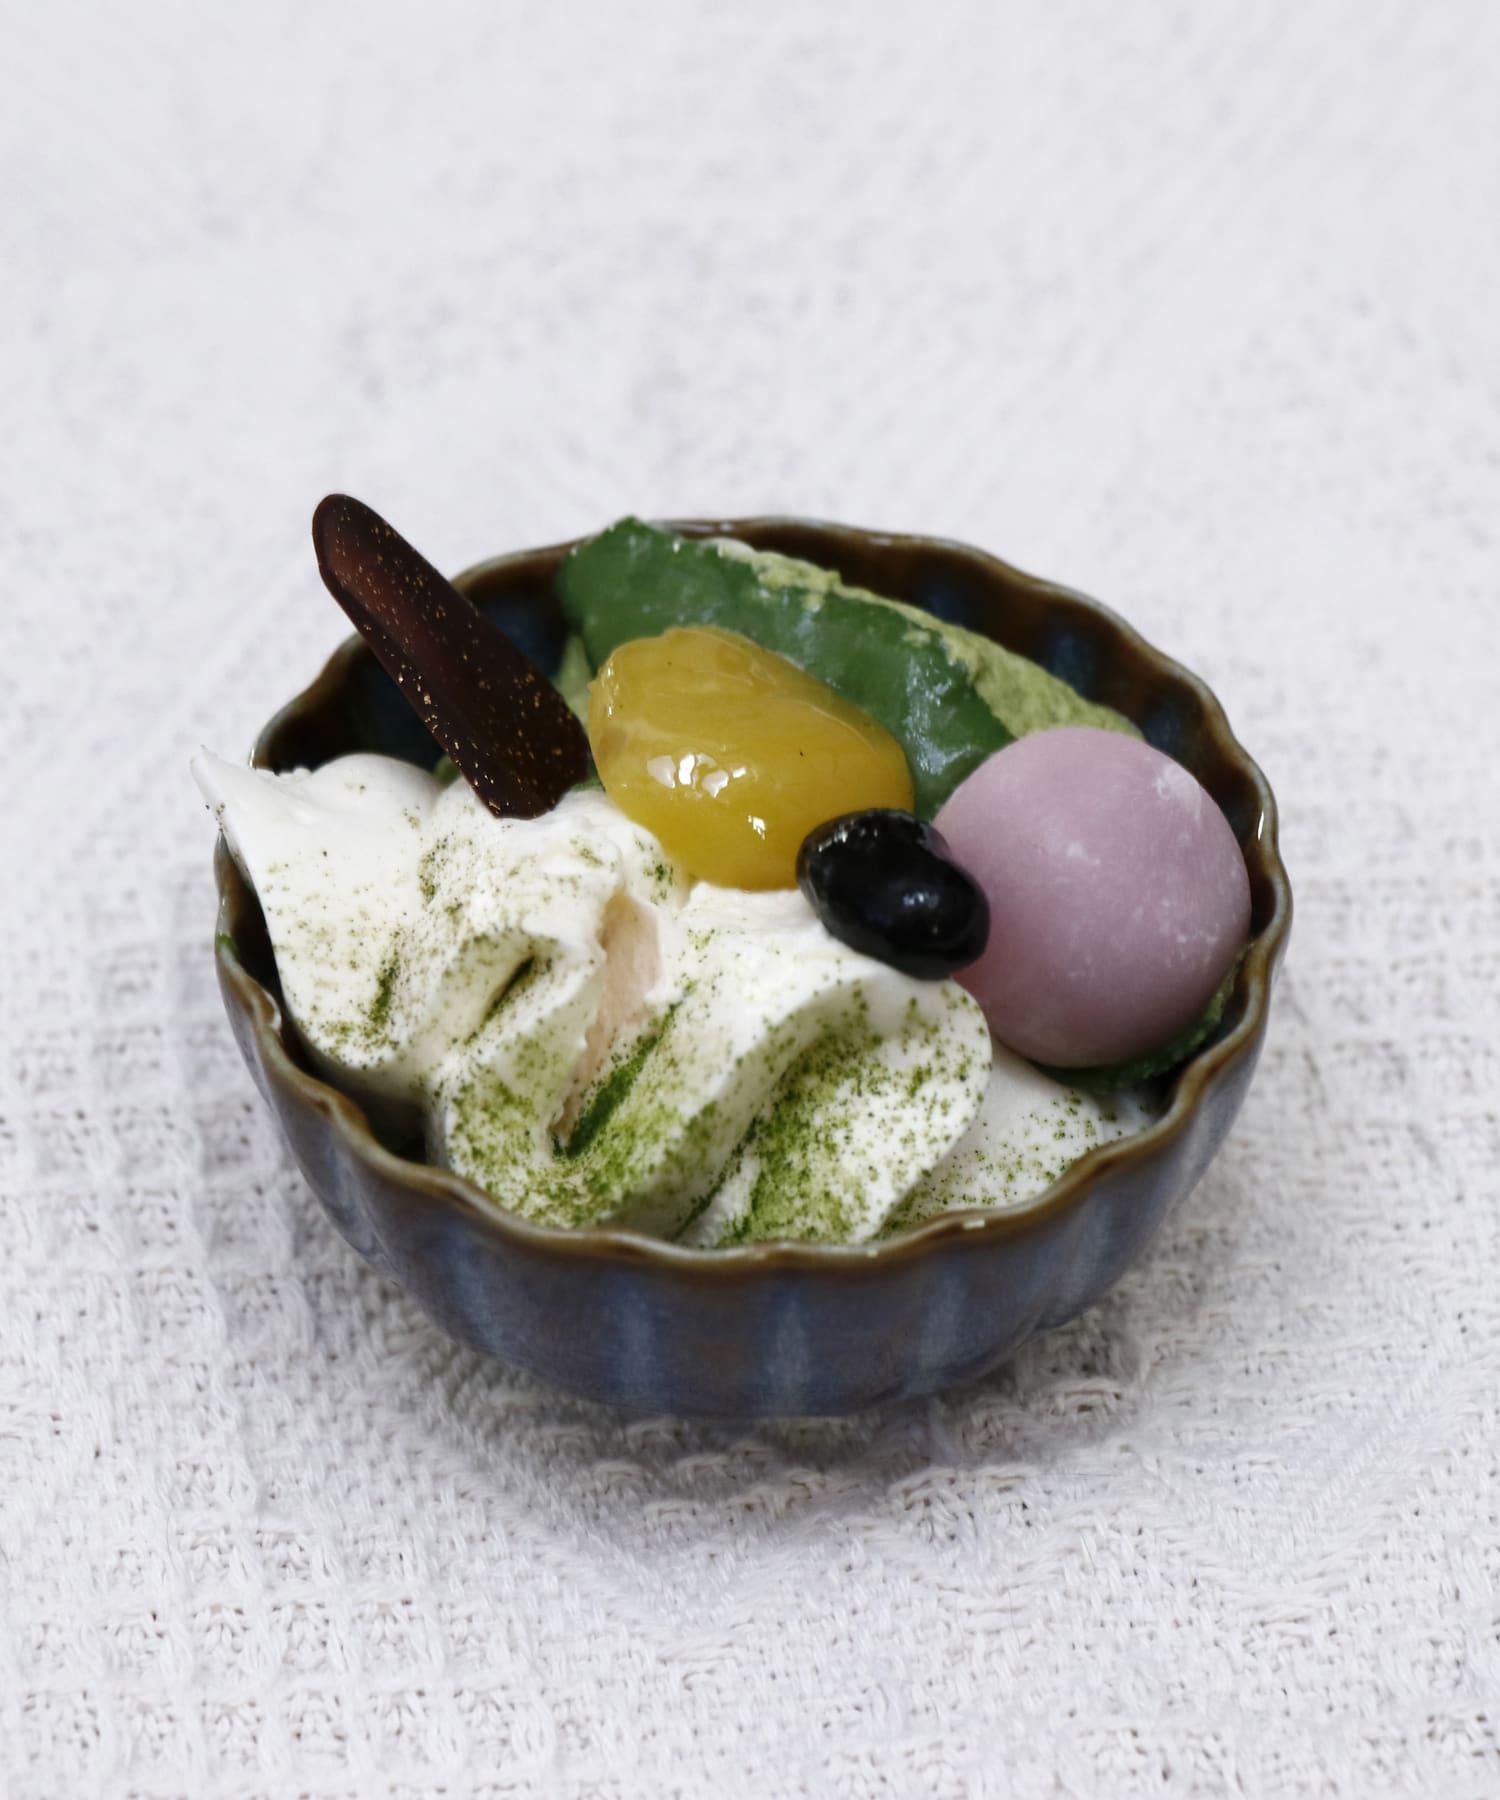 salut!(サリュ) salut!(サリュ) 【おしゃれな和食器】菊小鉢8cm ブルー